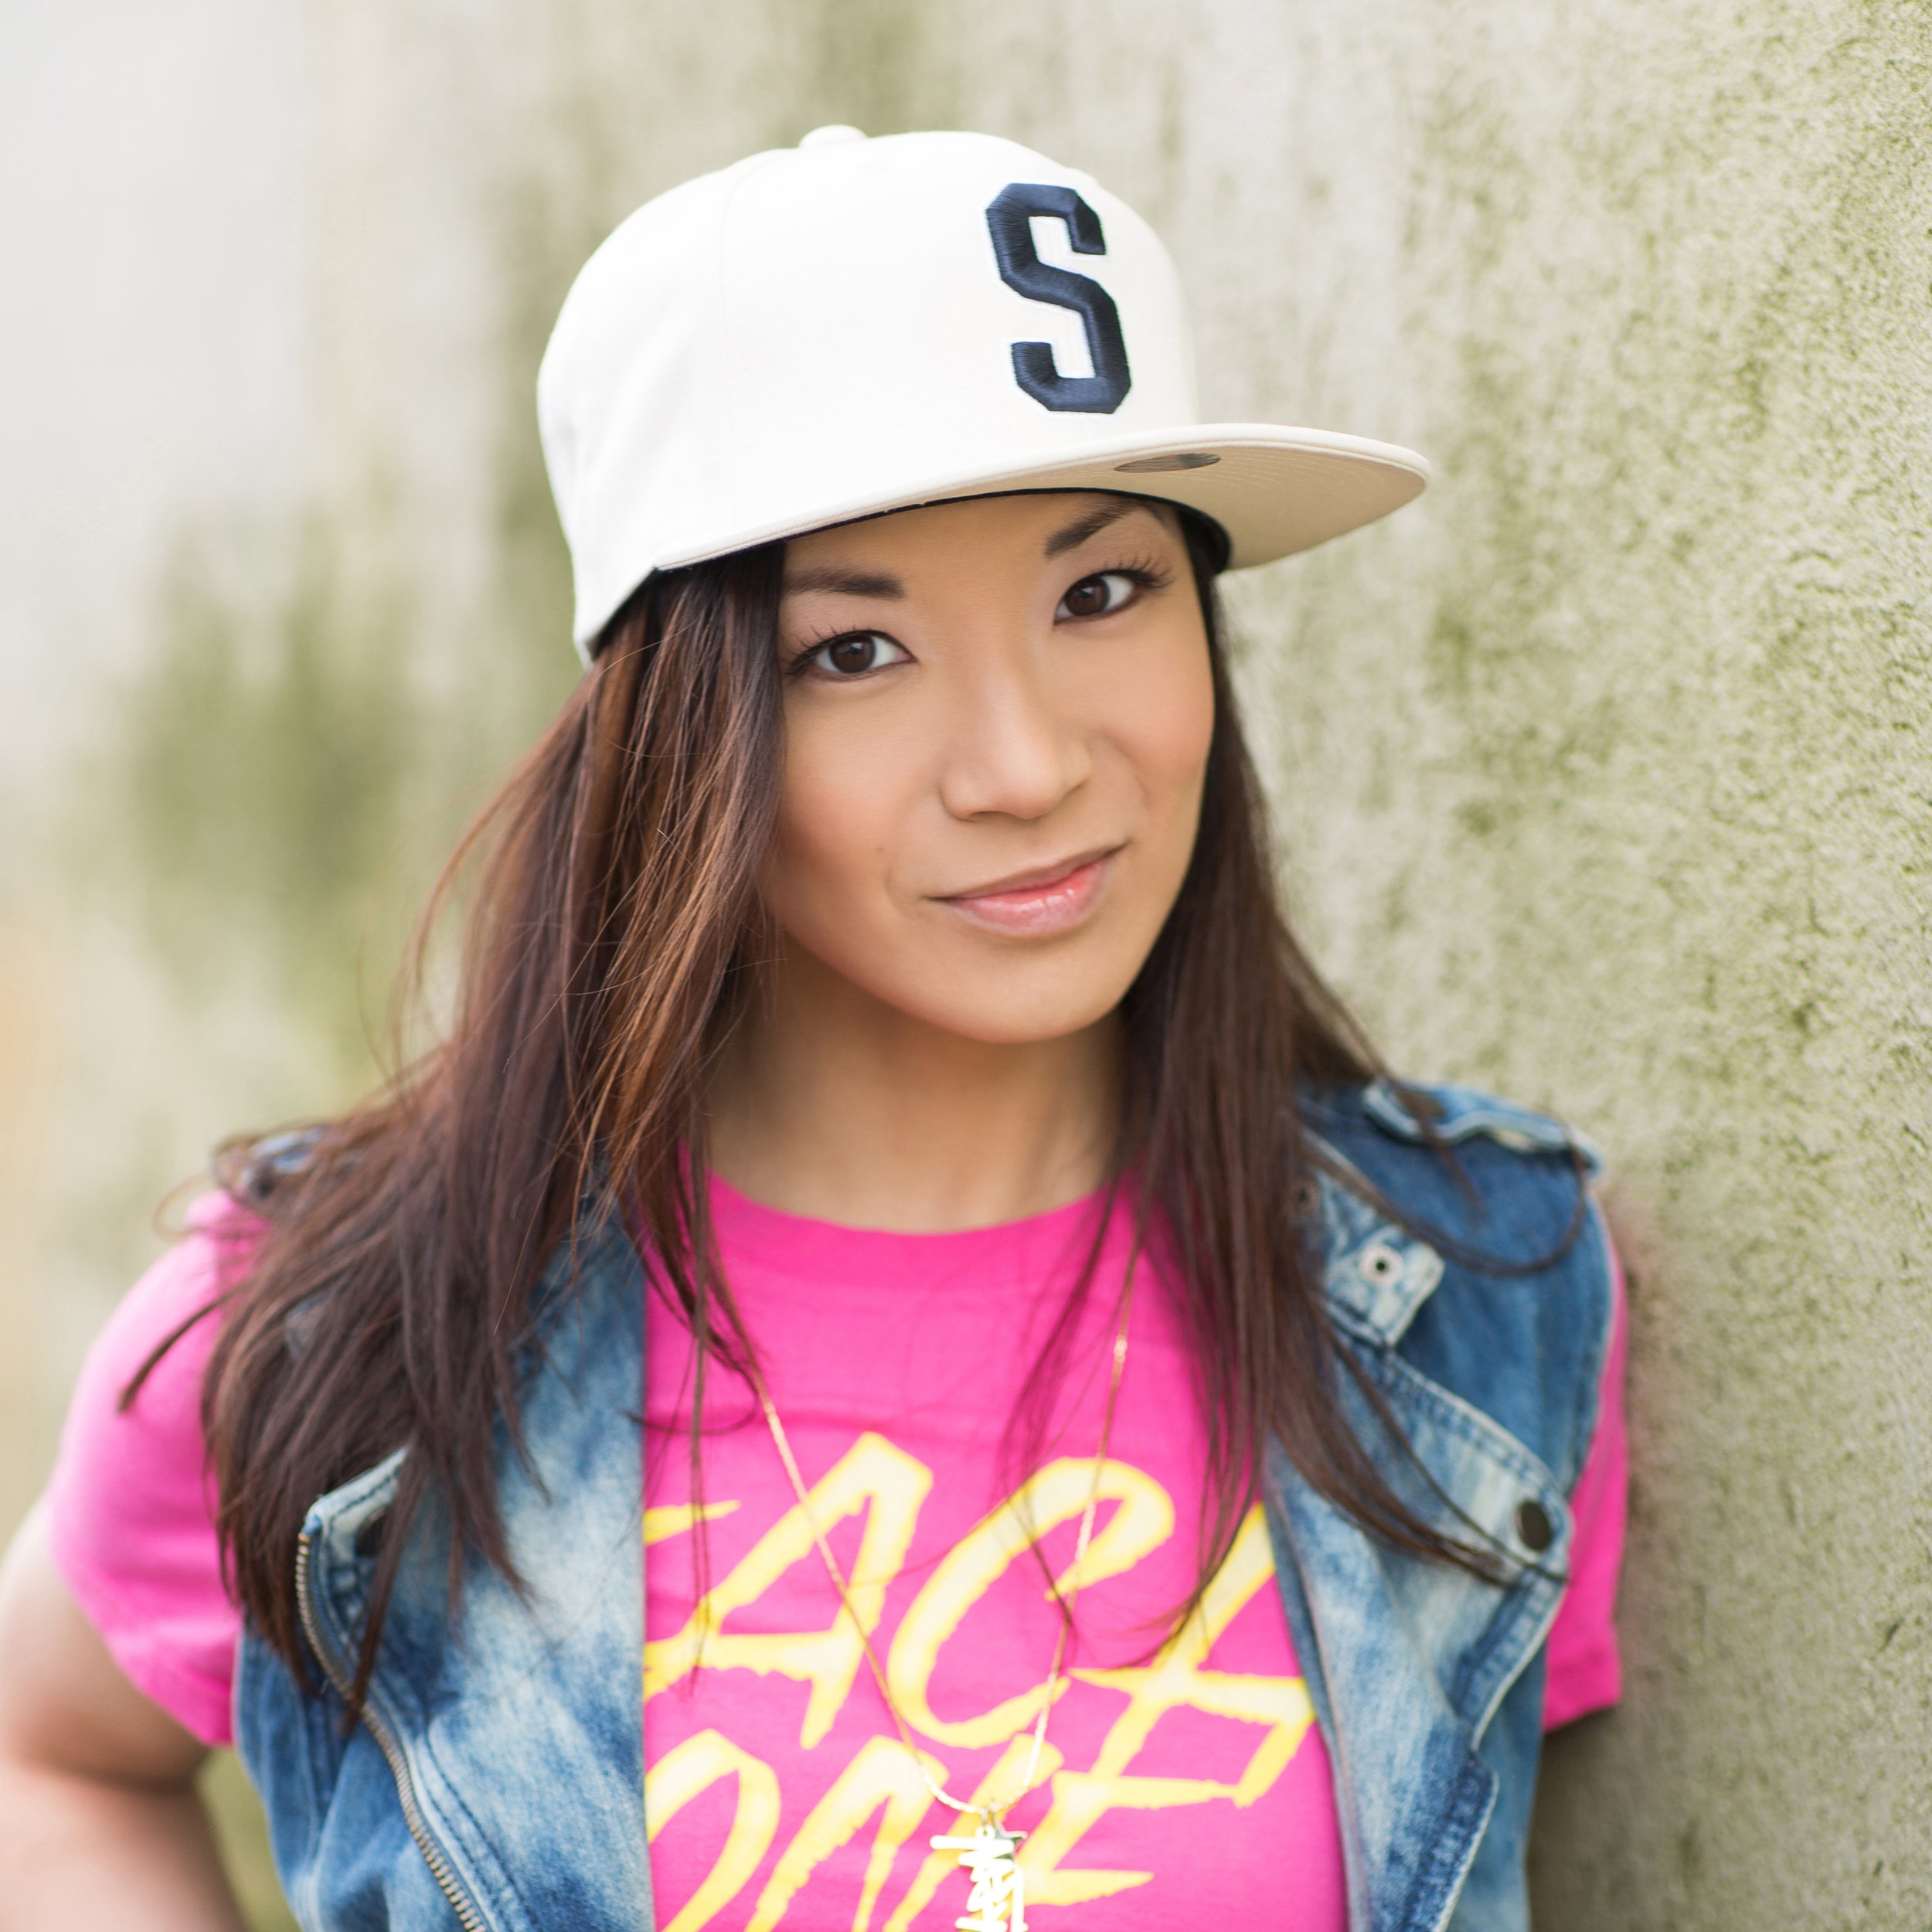 May 17: Kim Sato Locking Pop-Up Class